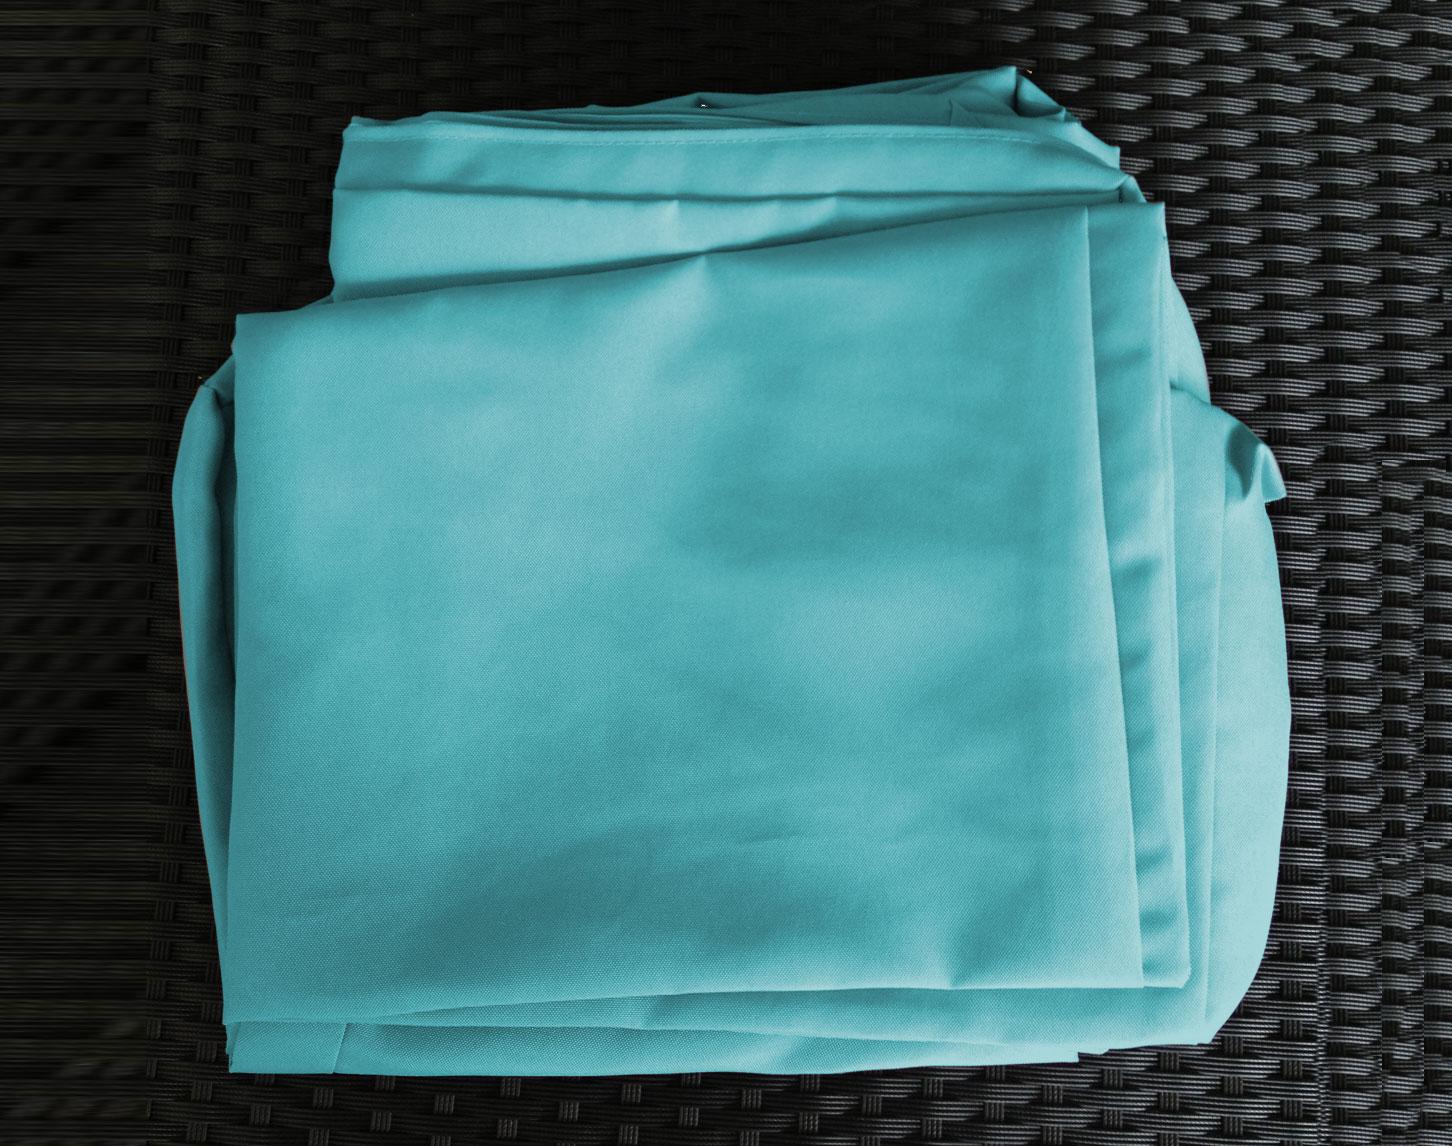 Bleu Pour Cancun Jardin Jeu Salon De Tissu Housses ybYgf67